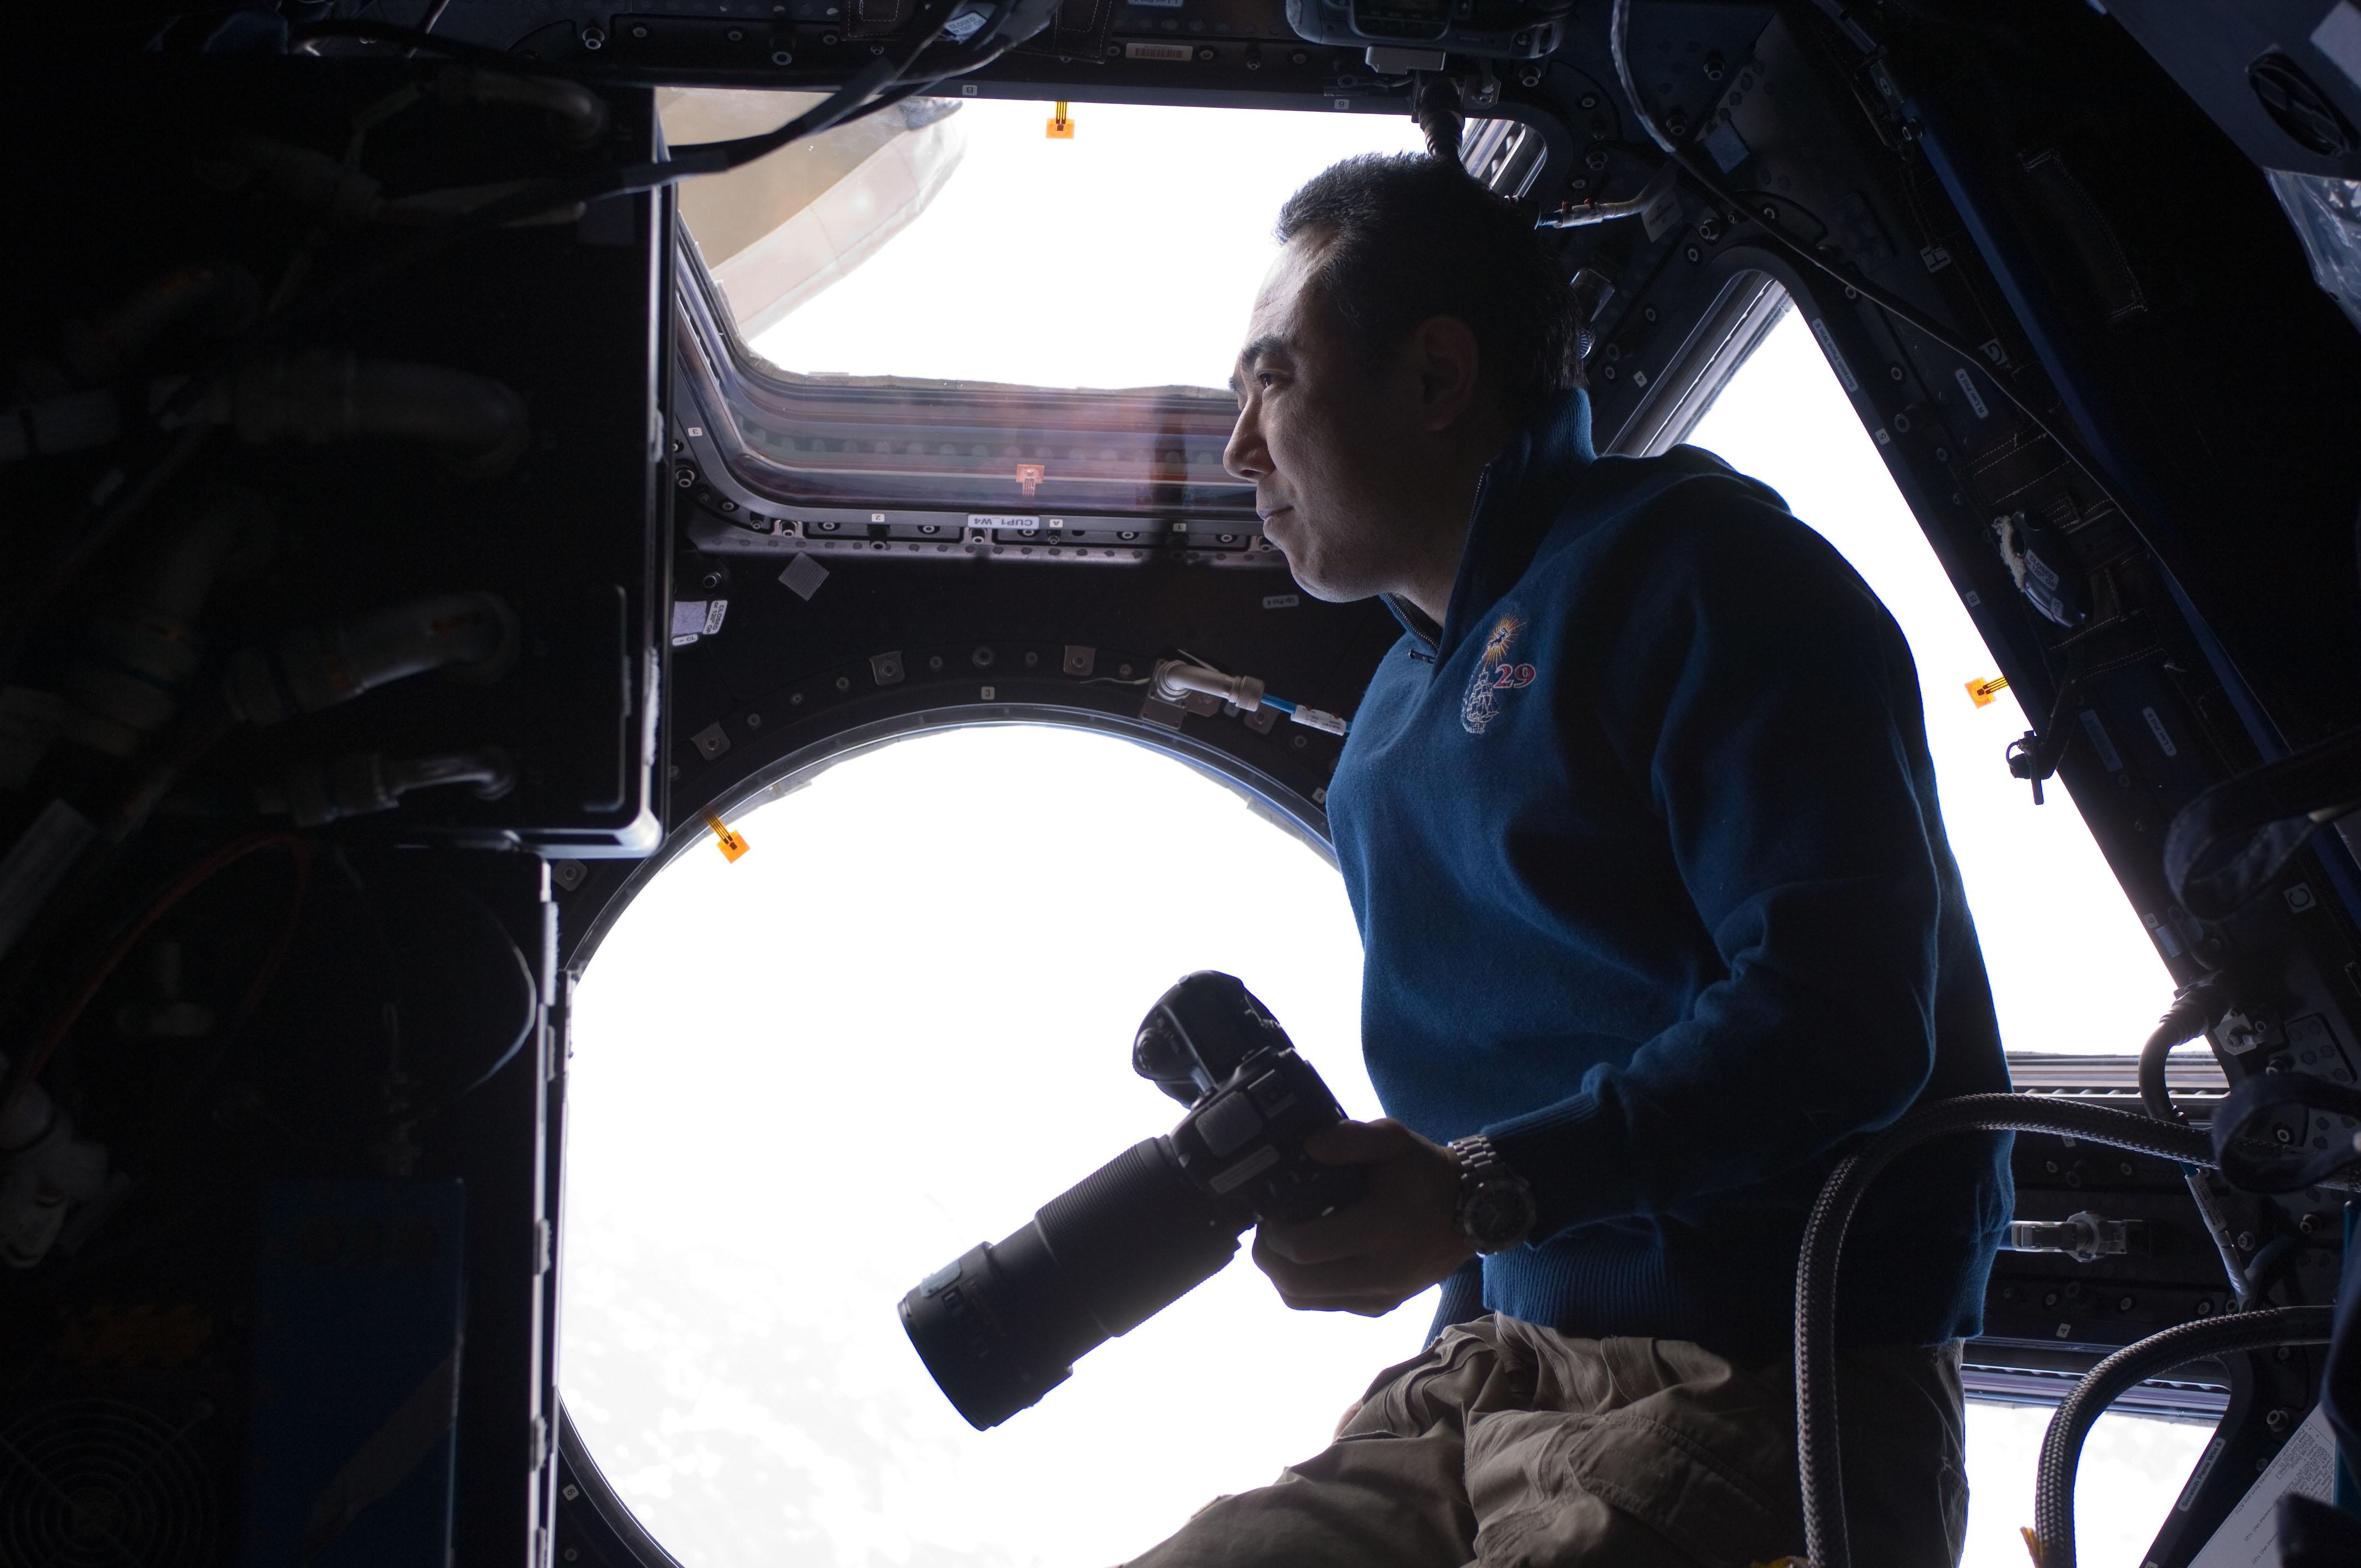 Satoshi Furukawa Holds a Still Camera in the ISS Cupola